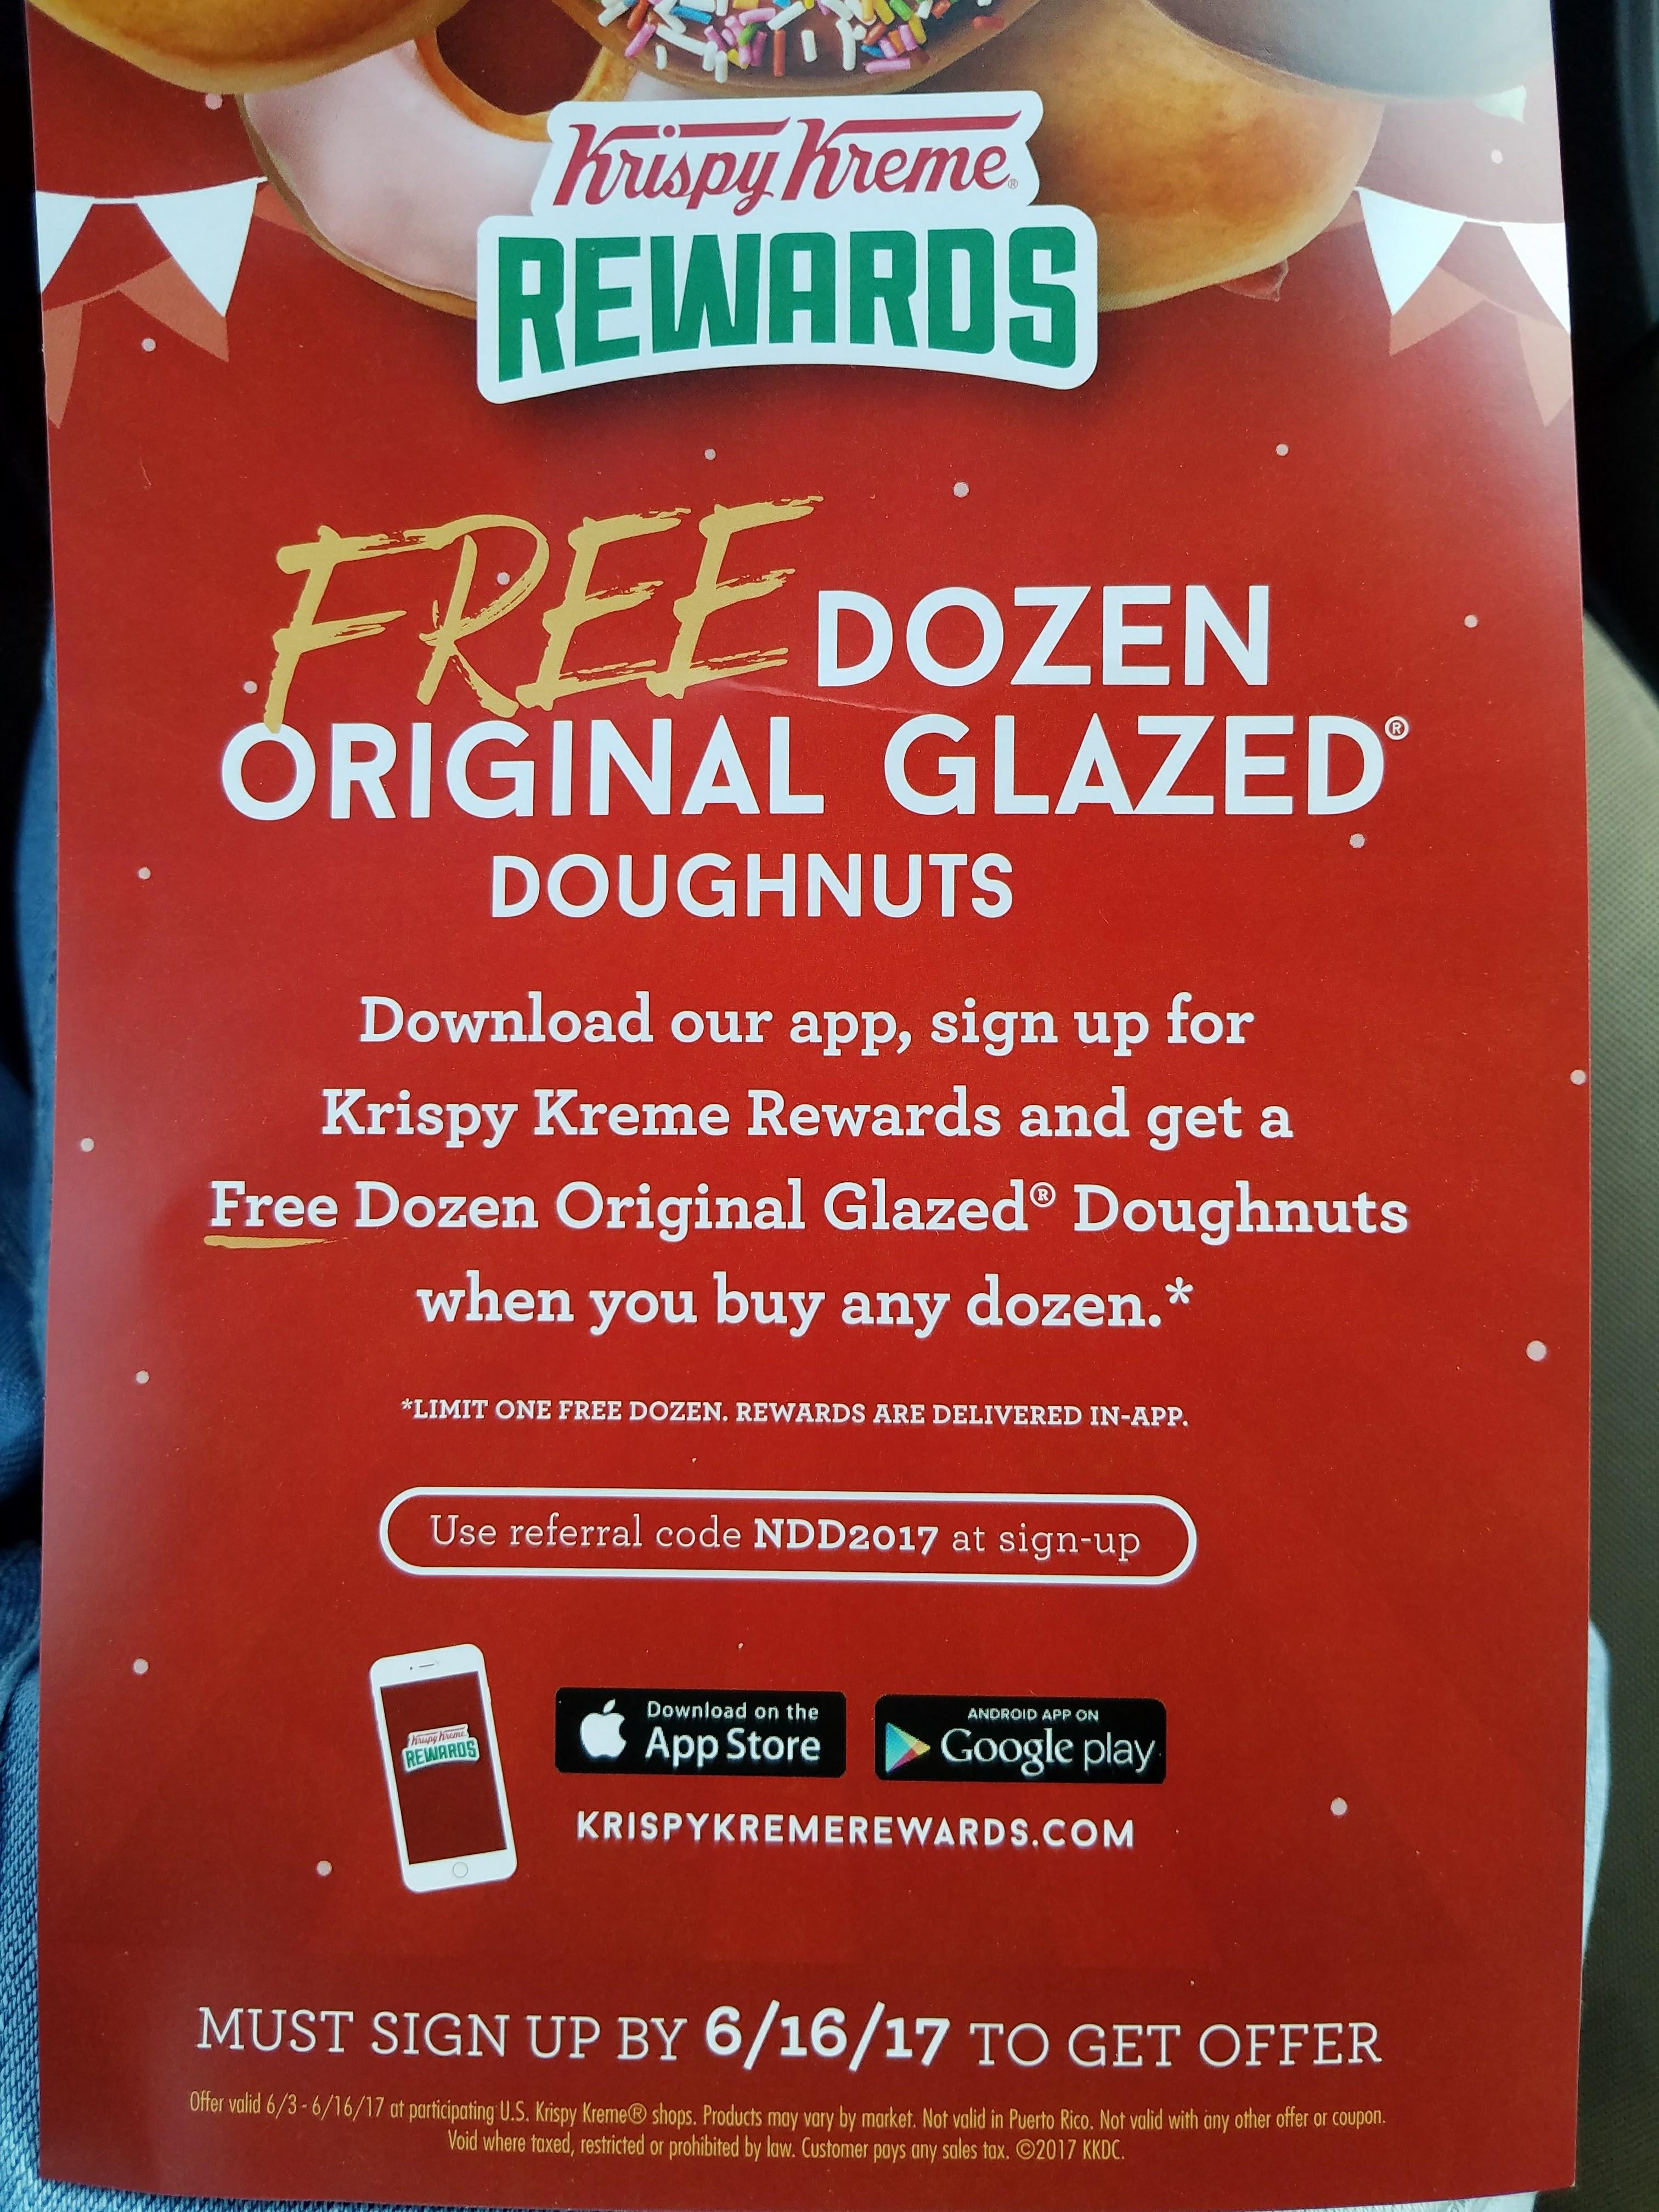 Free Dozen Original Glazed Doughnuts when you sign up for Krispy Kreme Rewards and buy any dozen